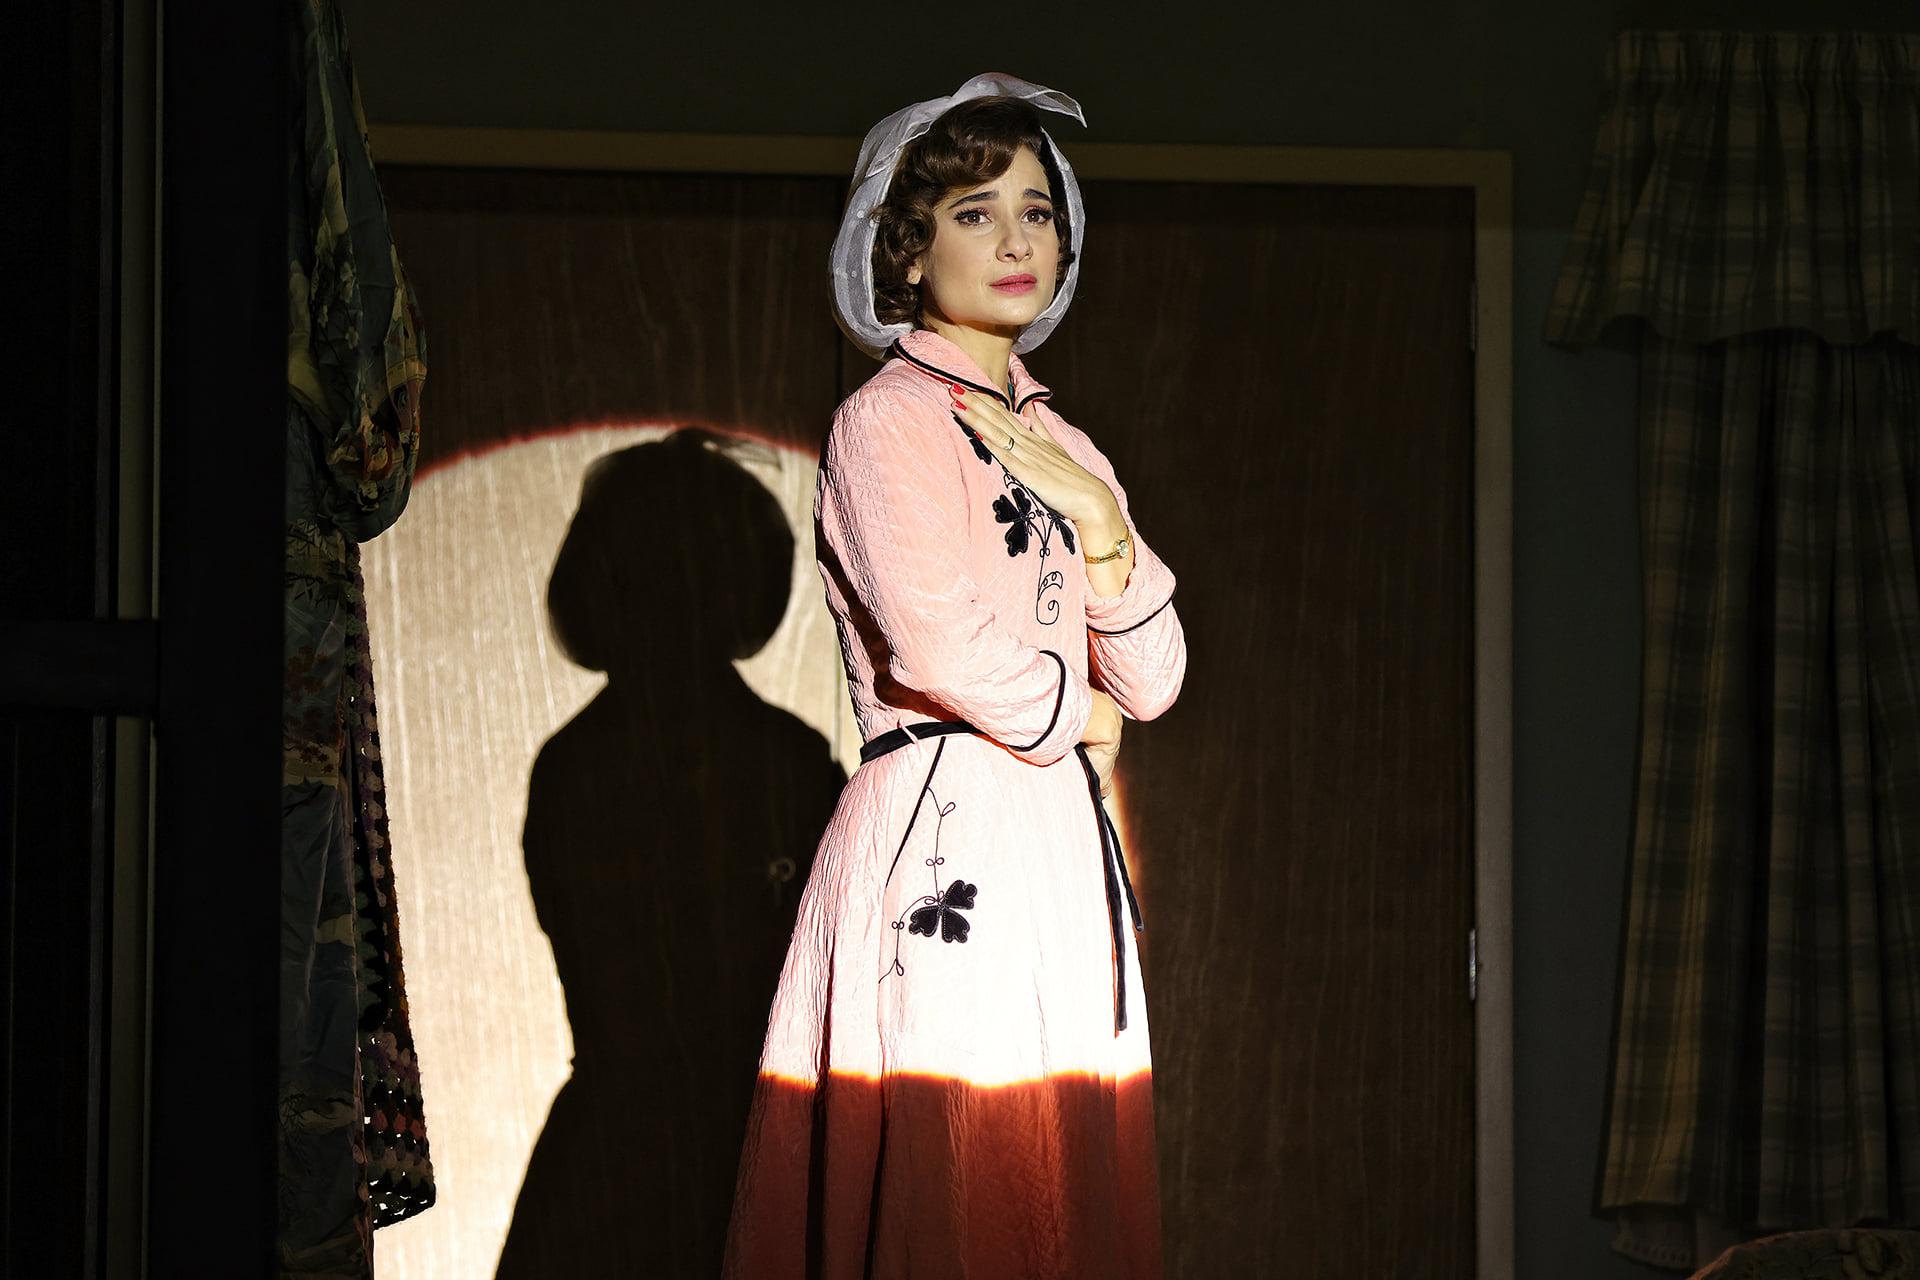 Home, I'm Darling – Sydney Theatre Company